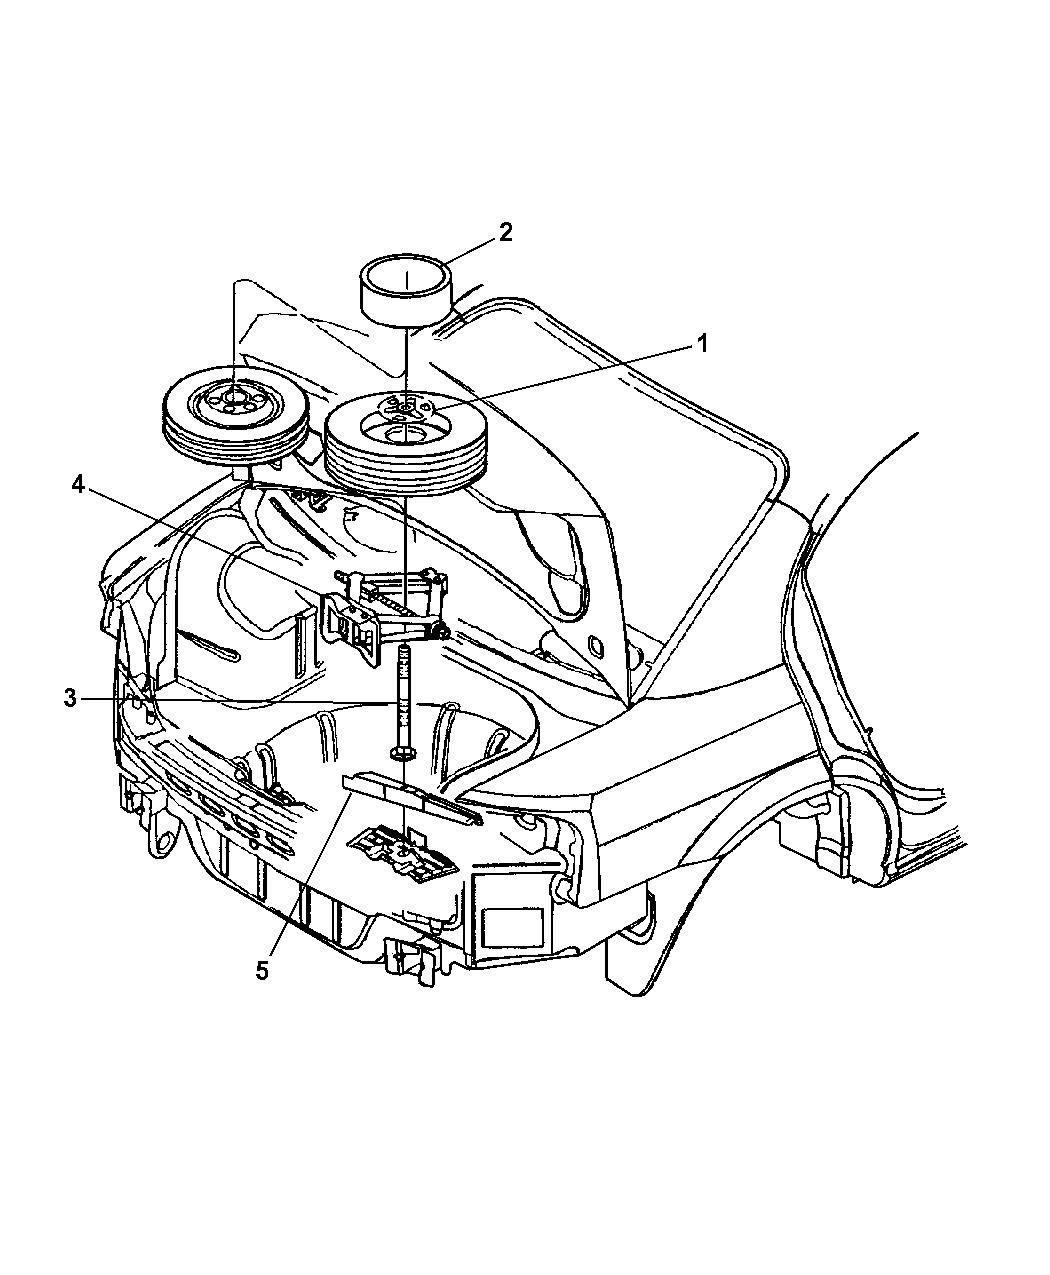 2005 Dodge Stratus Sedan Spare Tire Stowage Mopar Parts Giant Engine Diagram